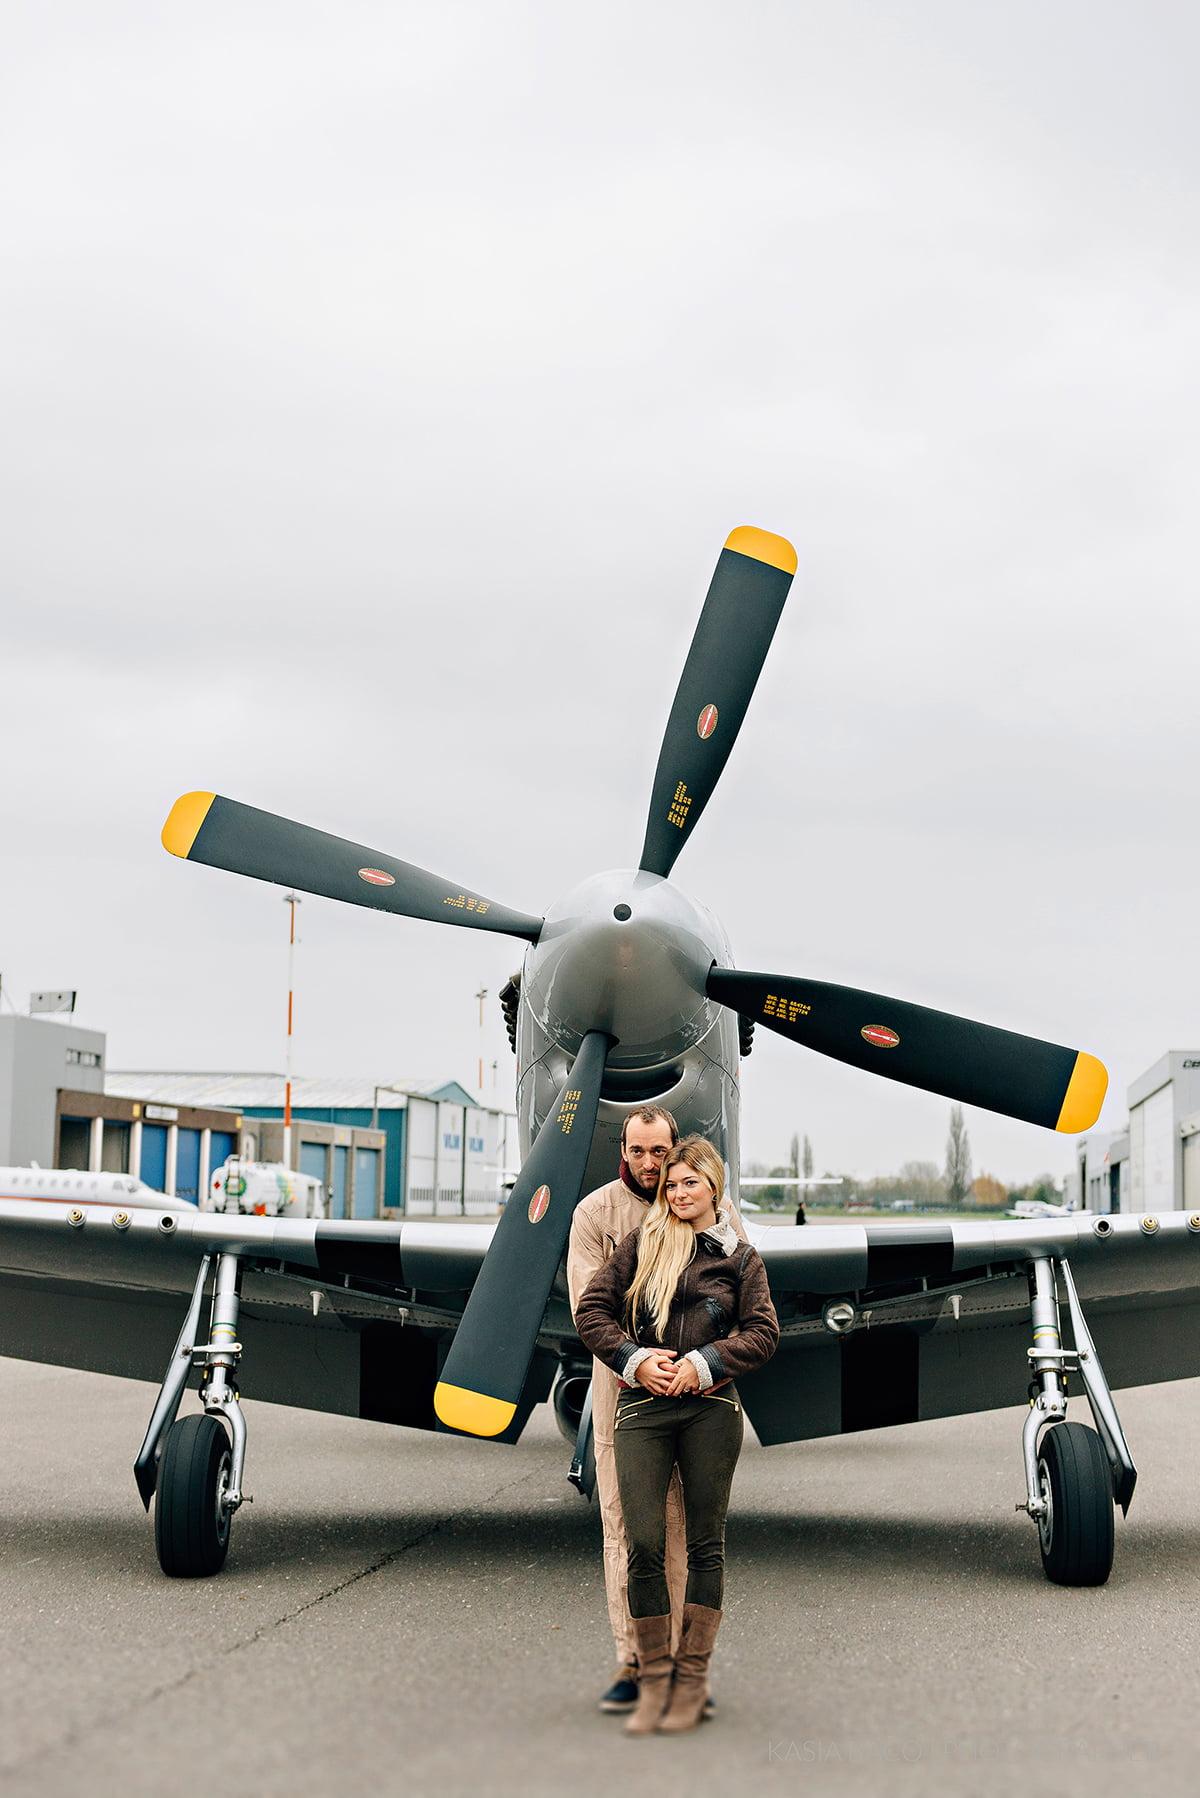 Mustang Antwerp Airport Birthday Flight Kasia Bacq-26